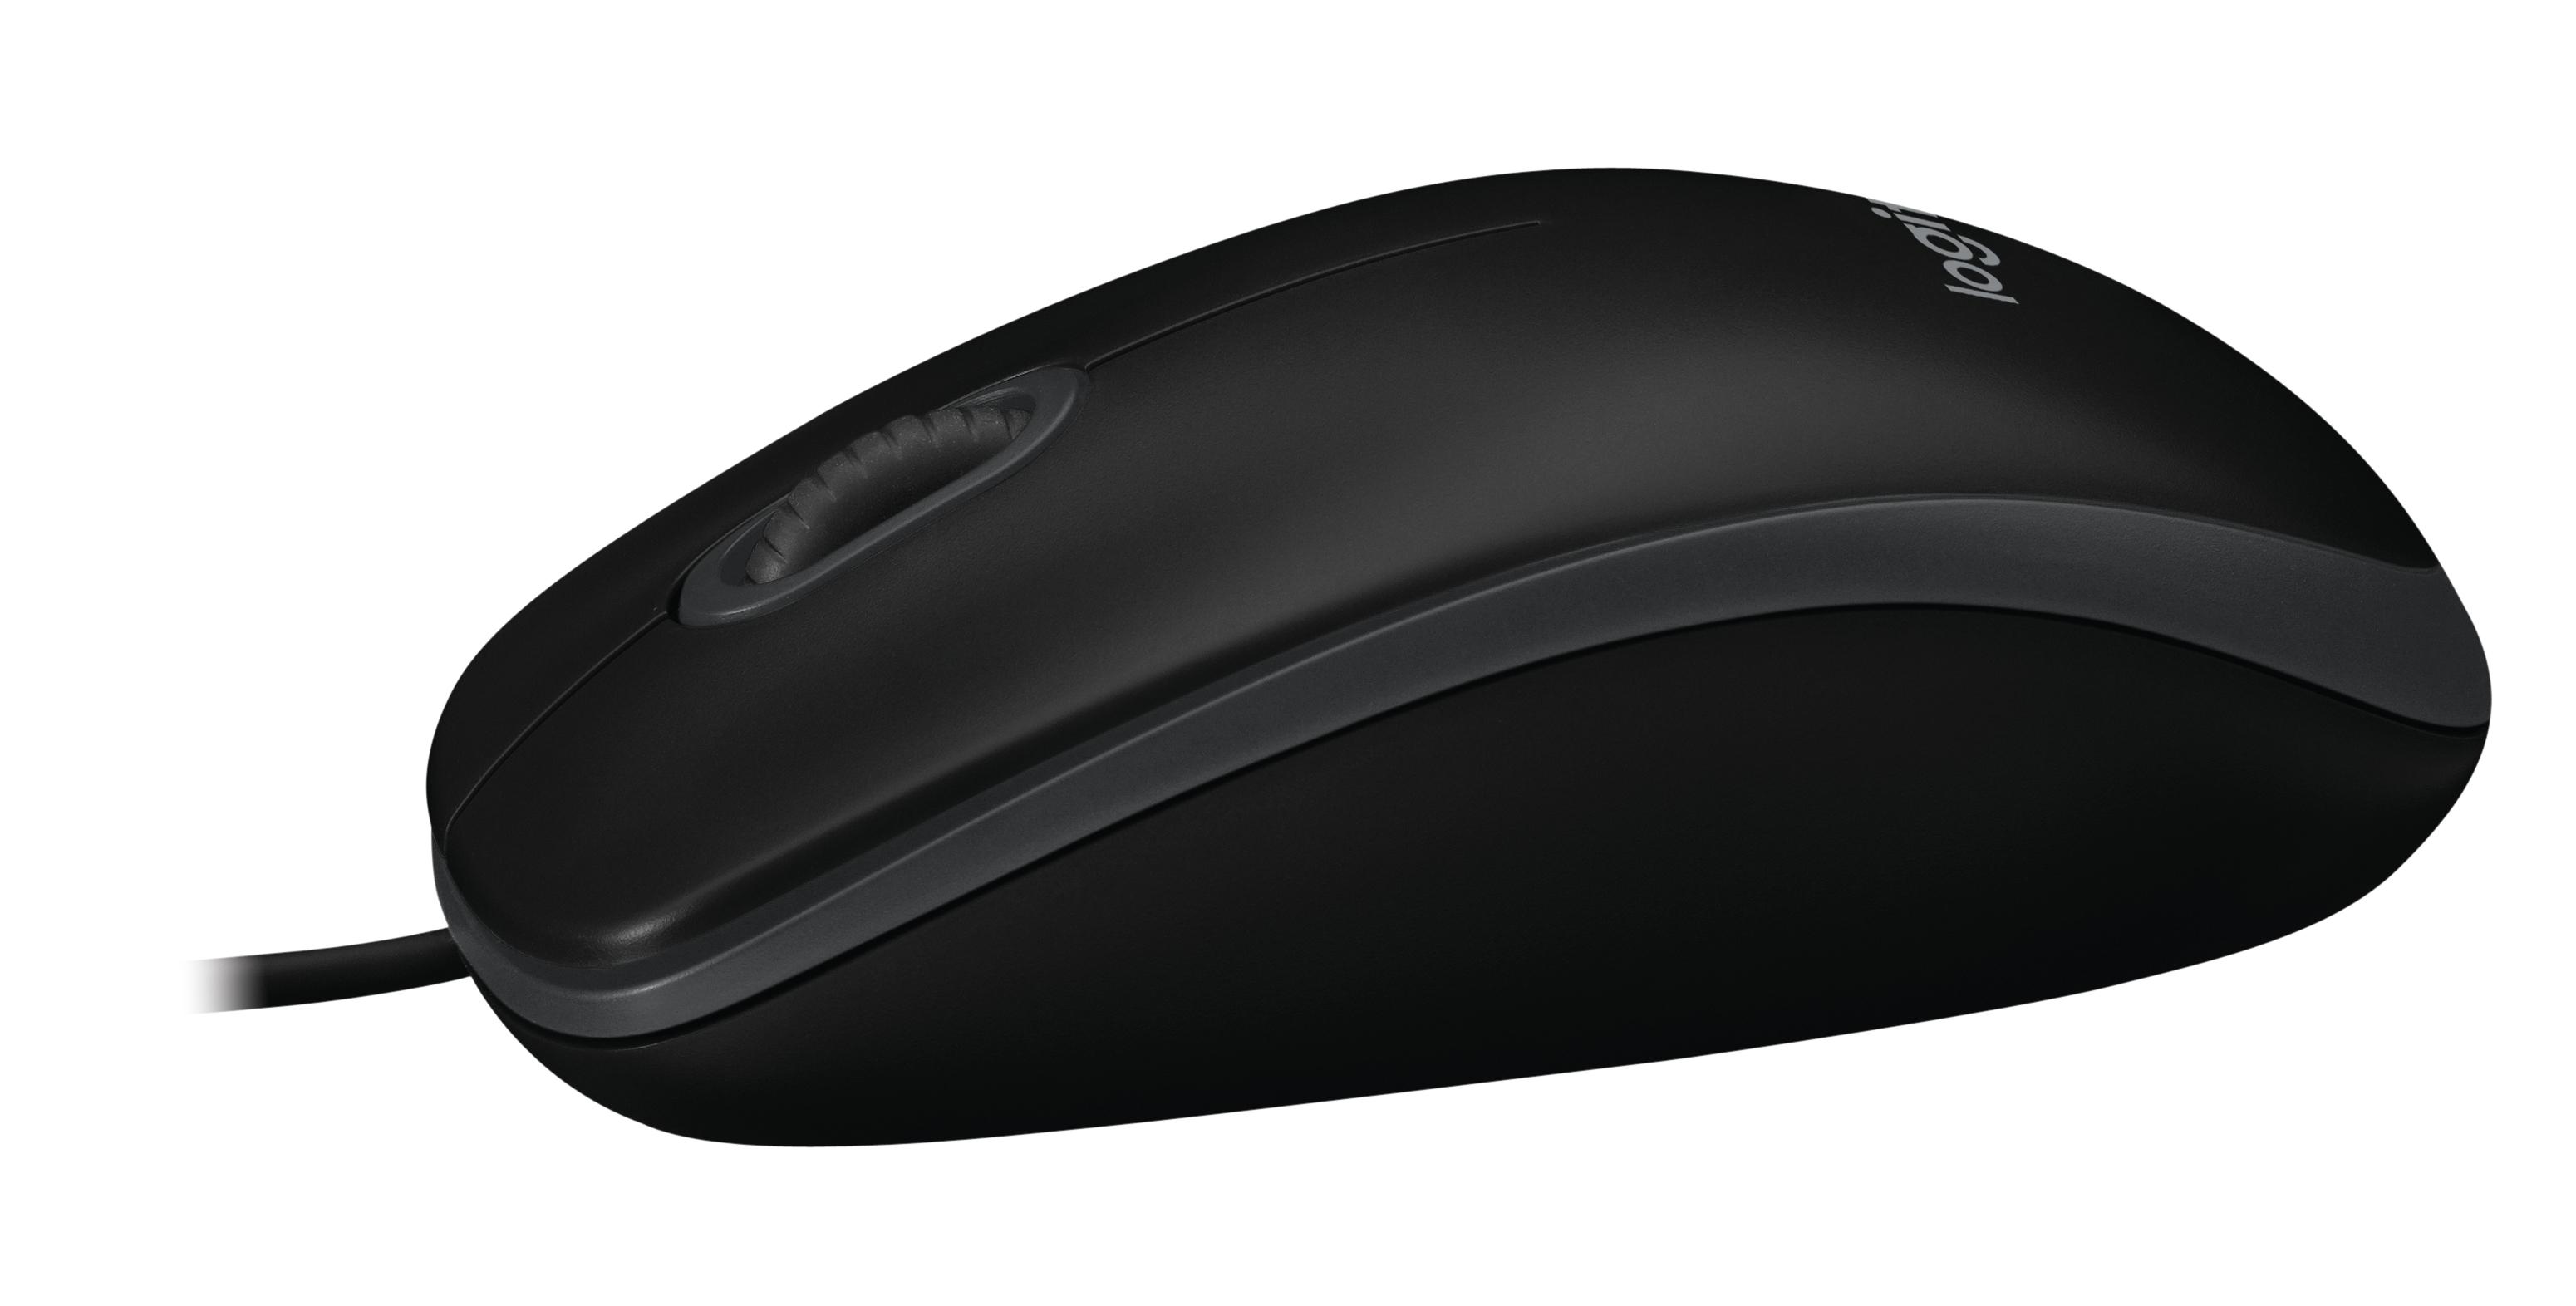 B100 Optical Mouse (zwart)